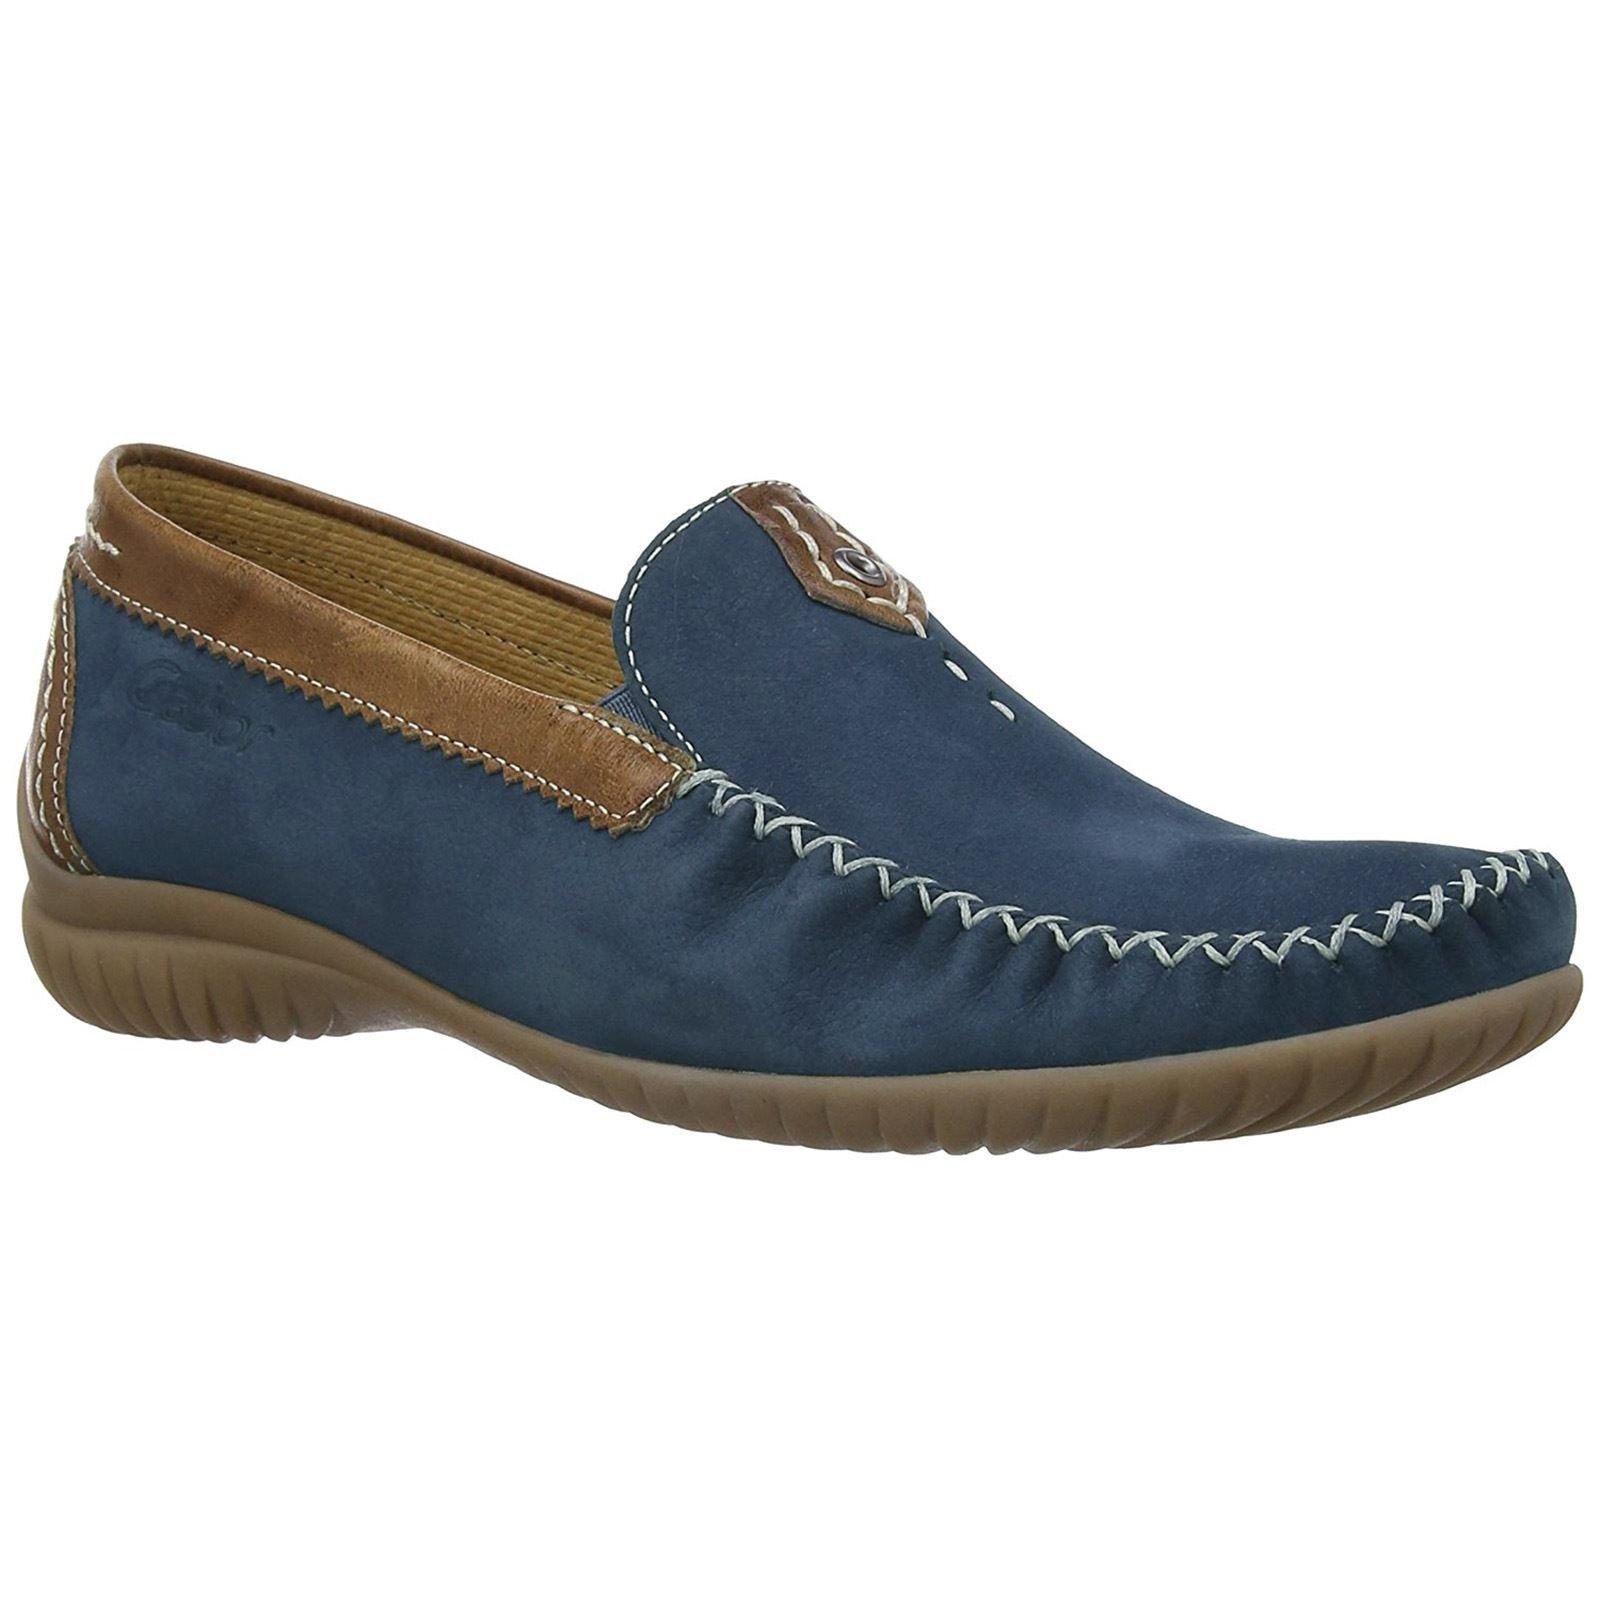 Gabor Womens California 86.090.46 Navy Copper Nubuck Shoes 8.5 US